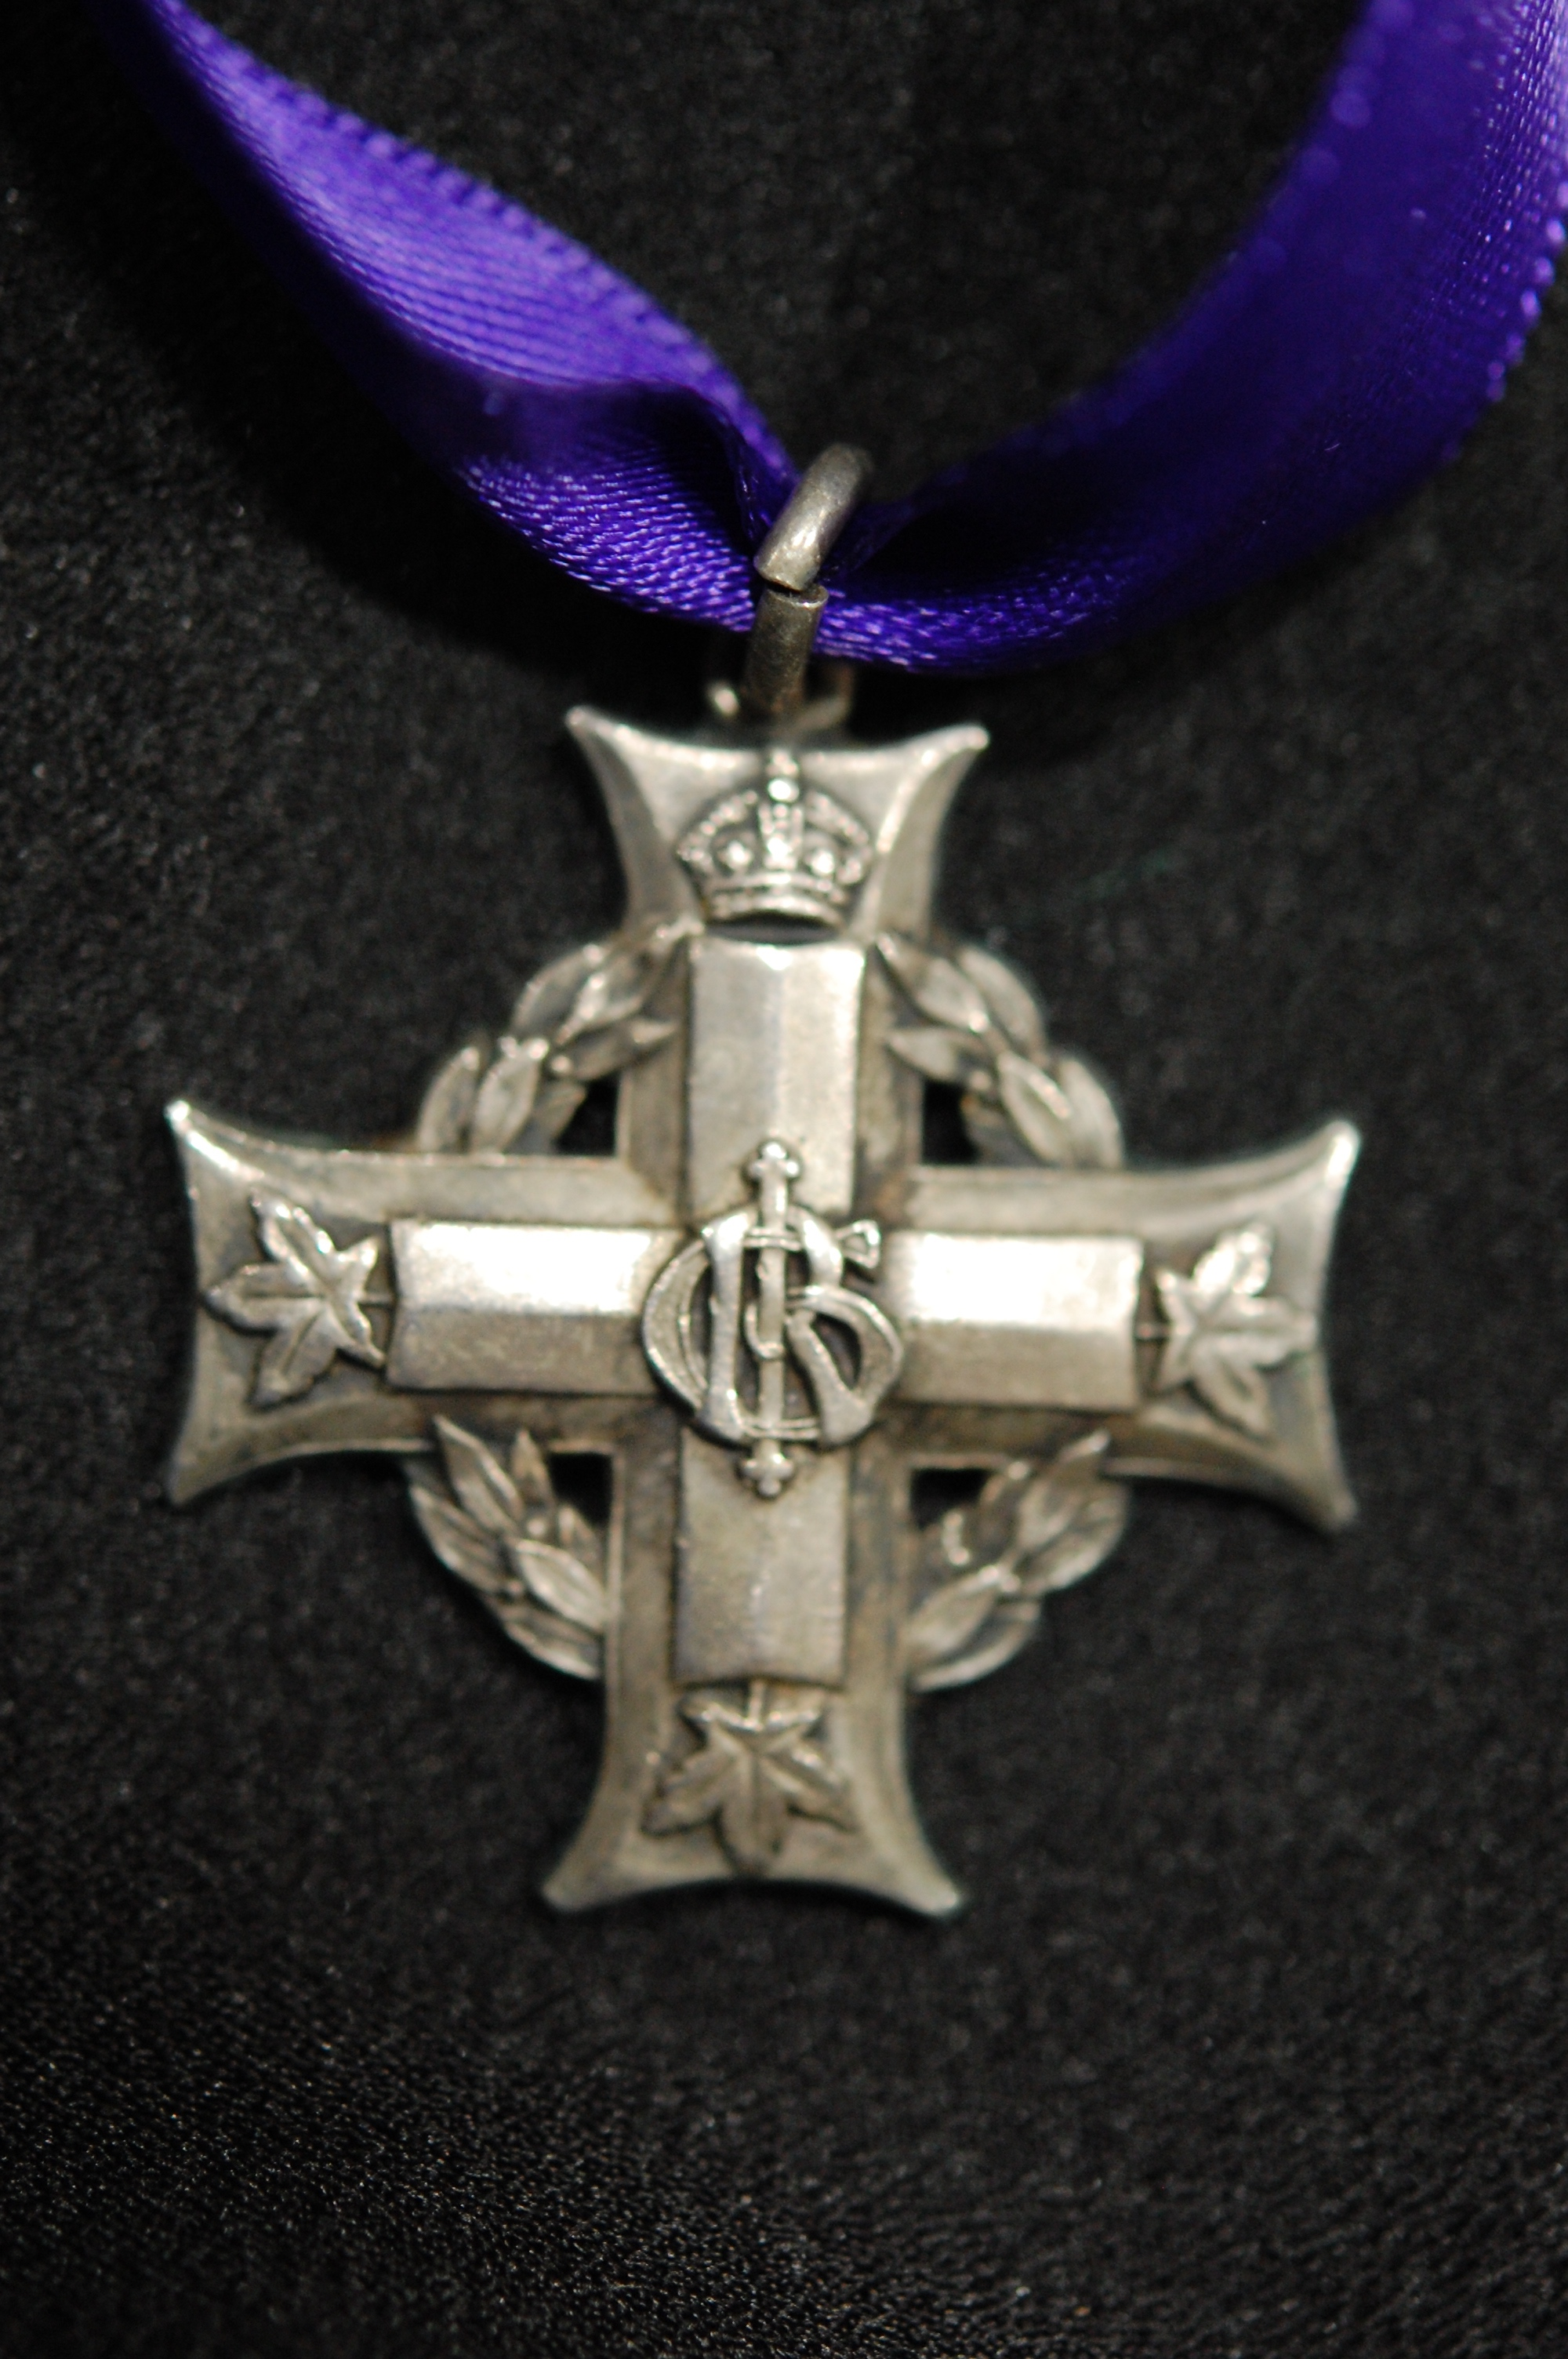 Memorial Cross (George V) (3035987 Pte D C  Lowrey) 3rd Bn (born North  Hastings County, Ontario) KIA October 13, 1918